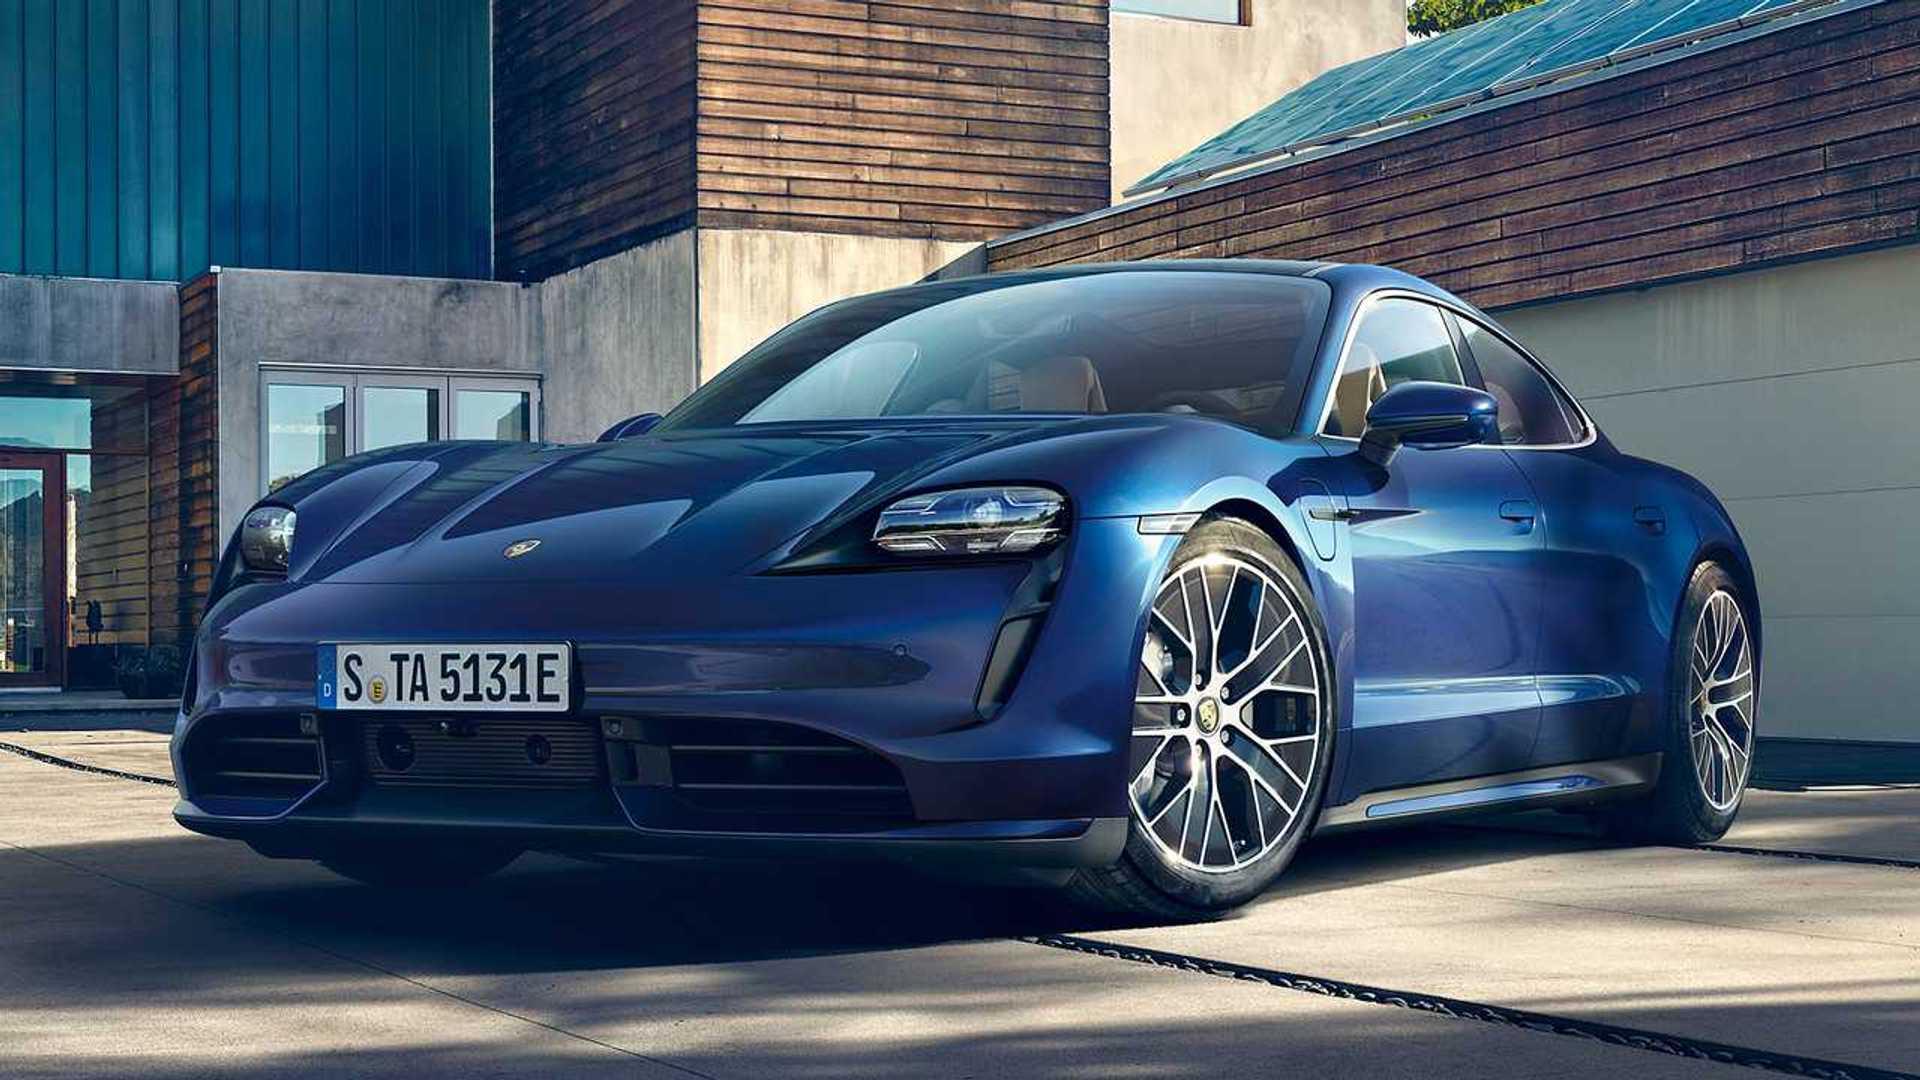 2020 Porsche Taycan Production Starts On Monday